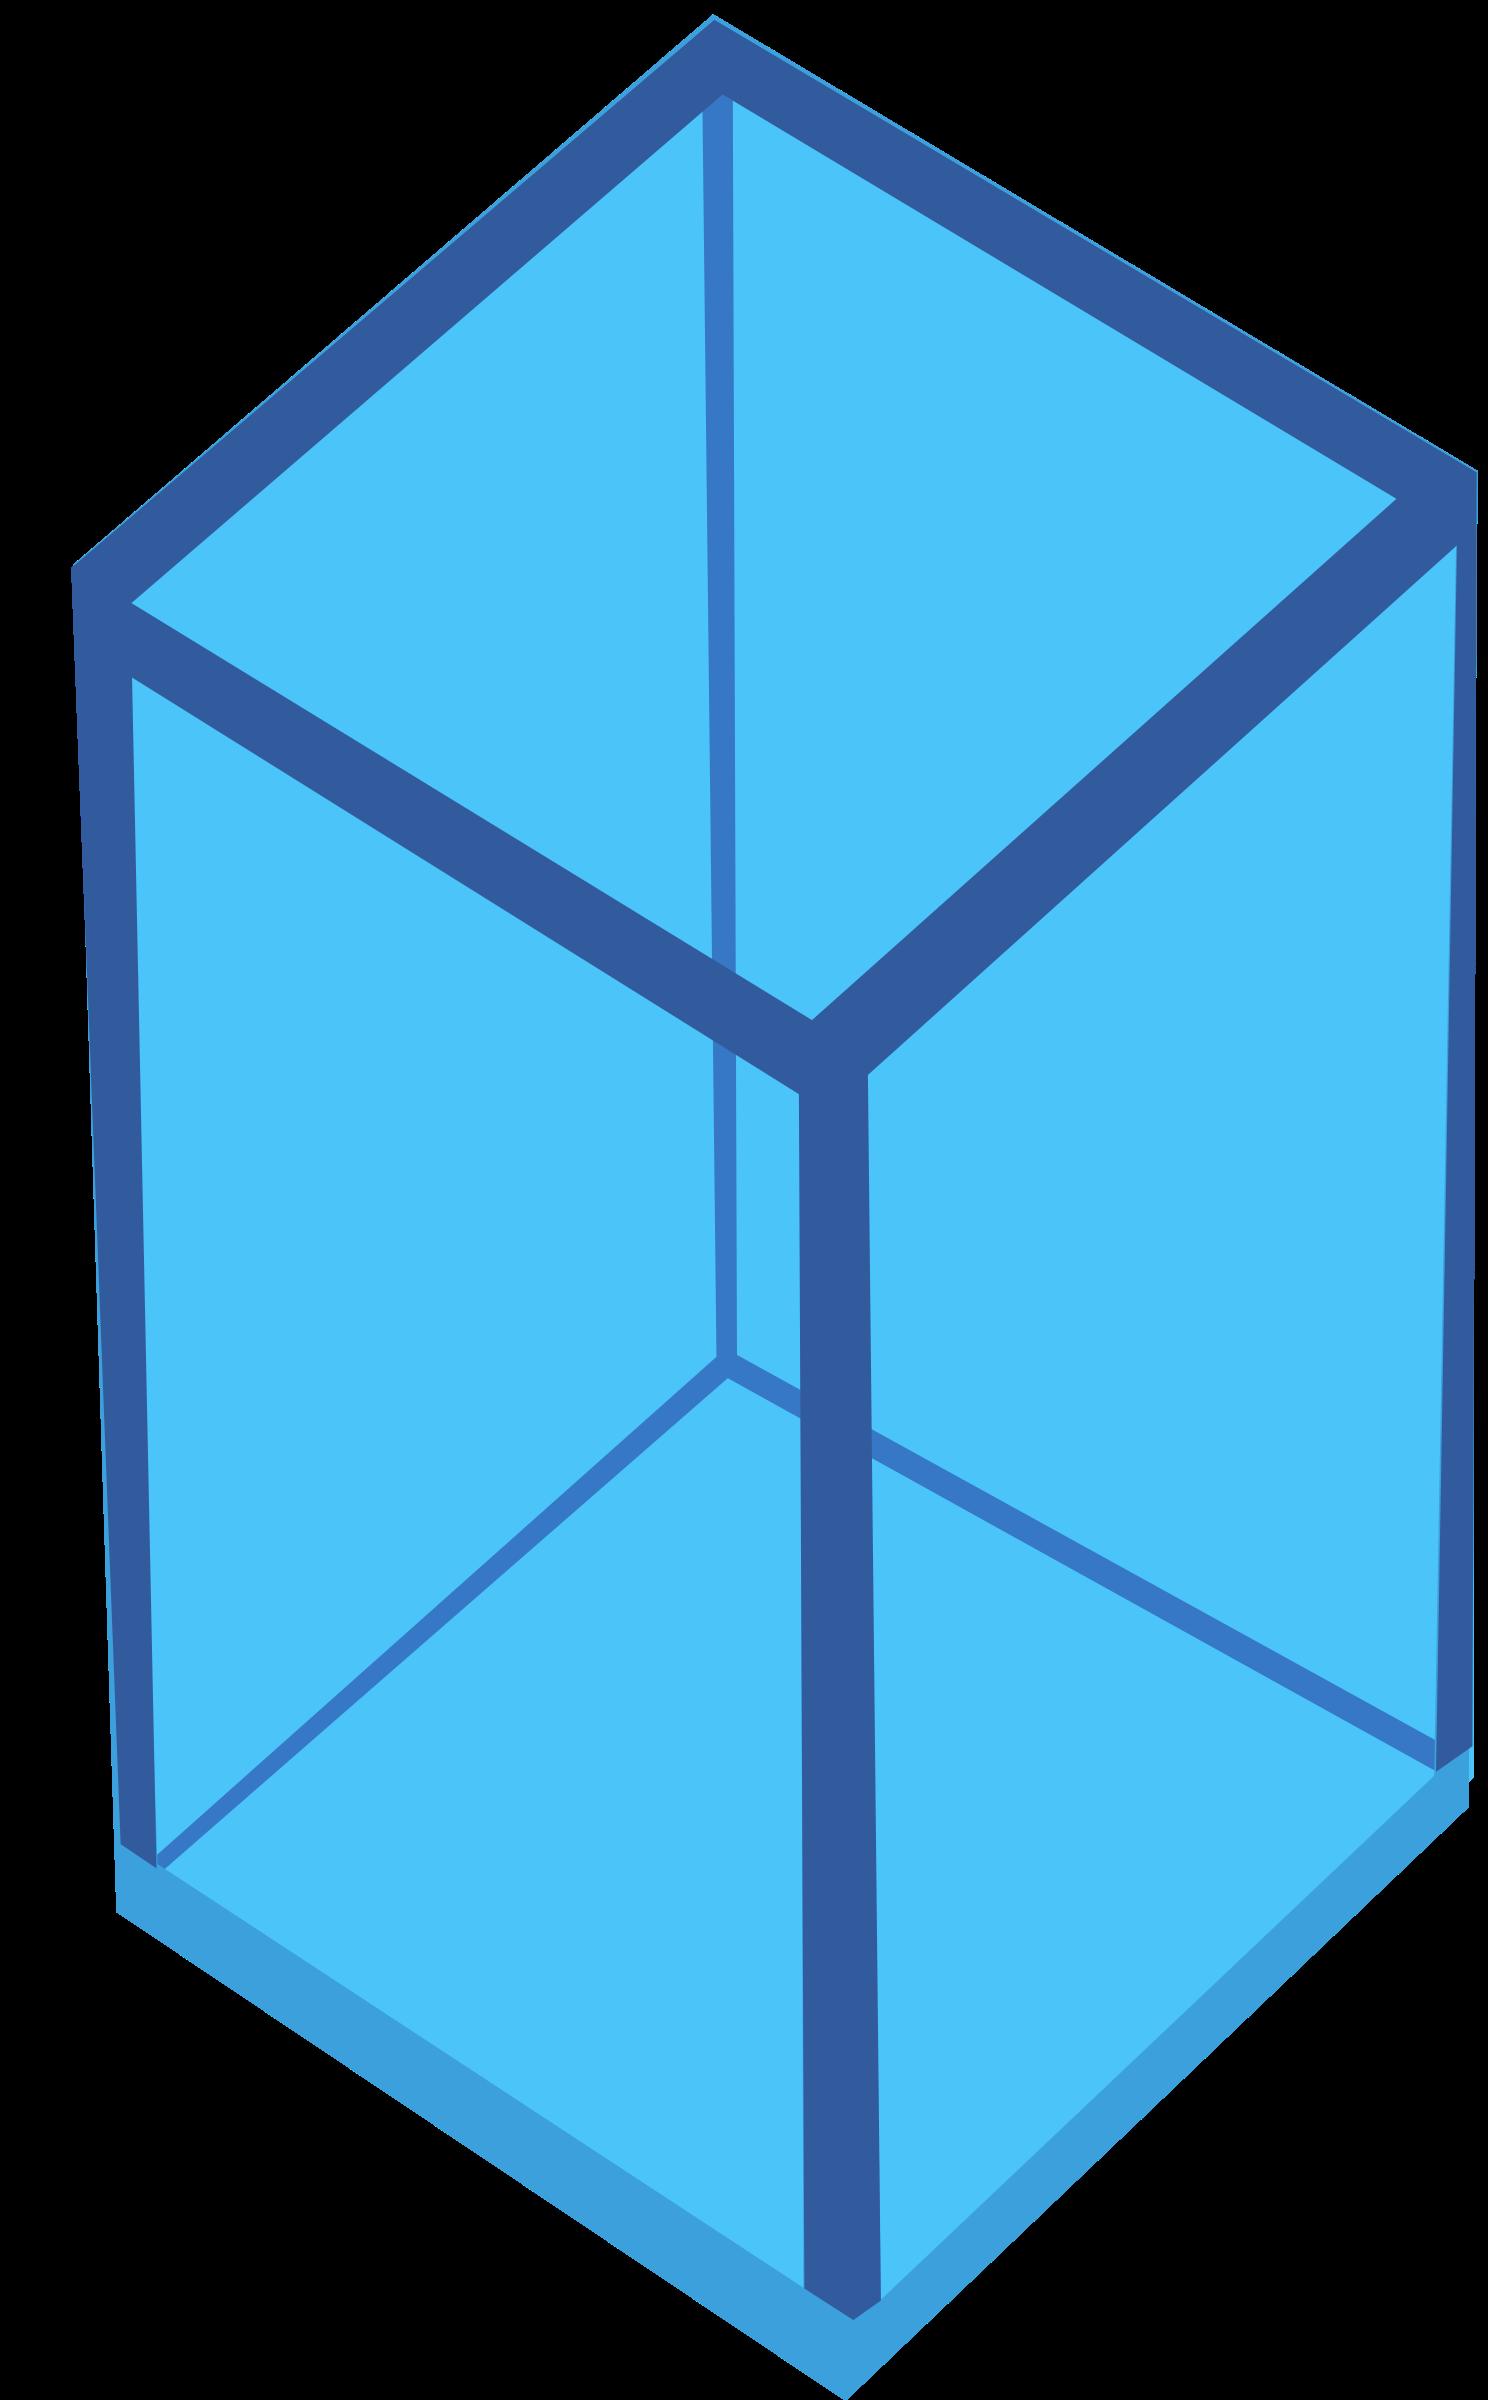 Cube blue cube